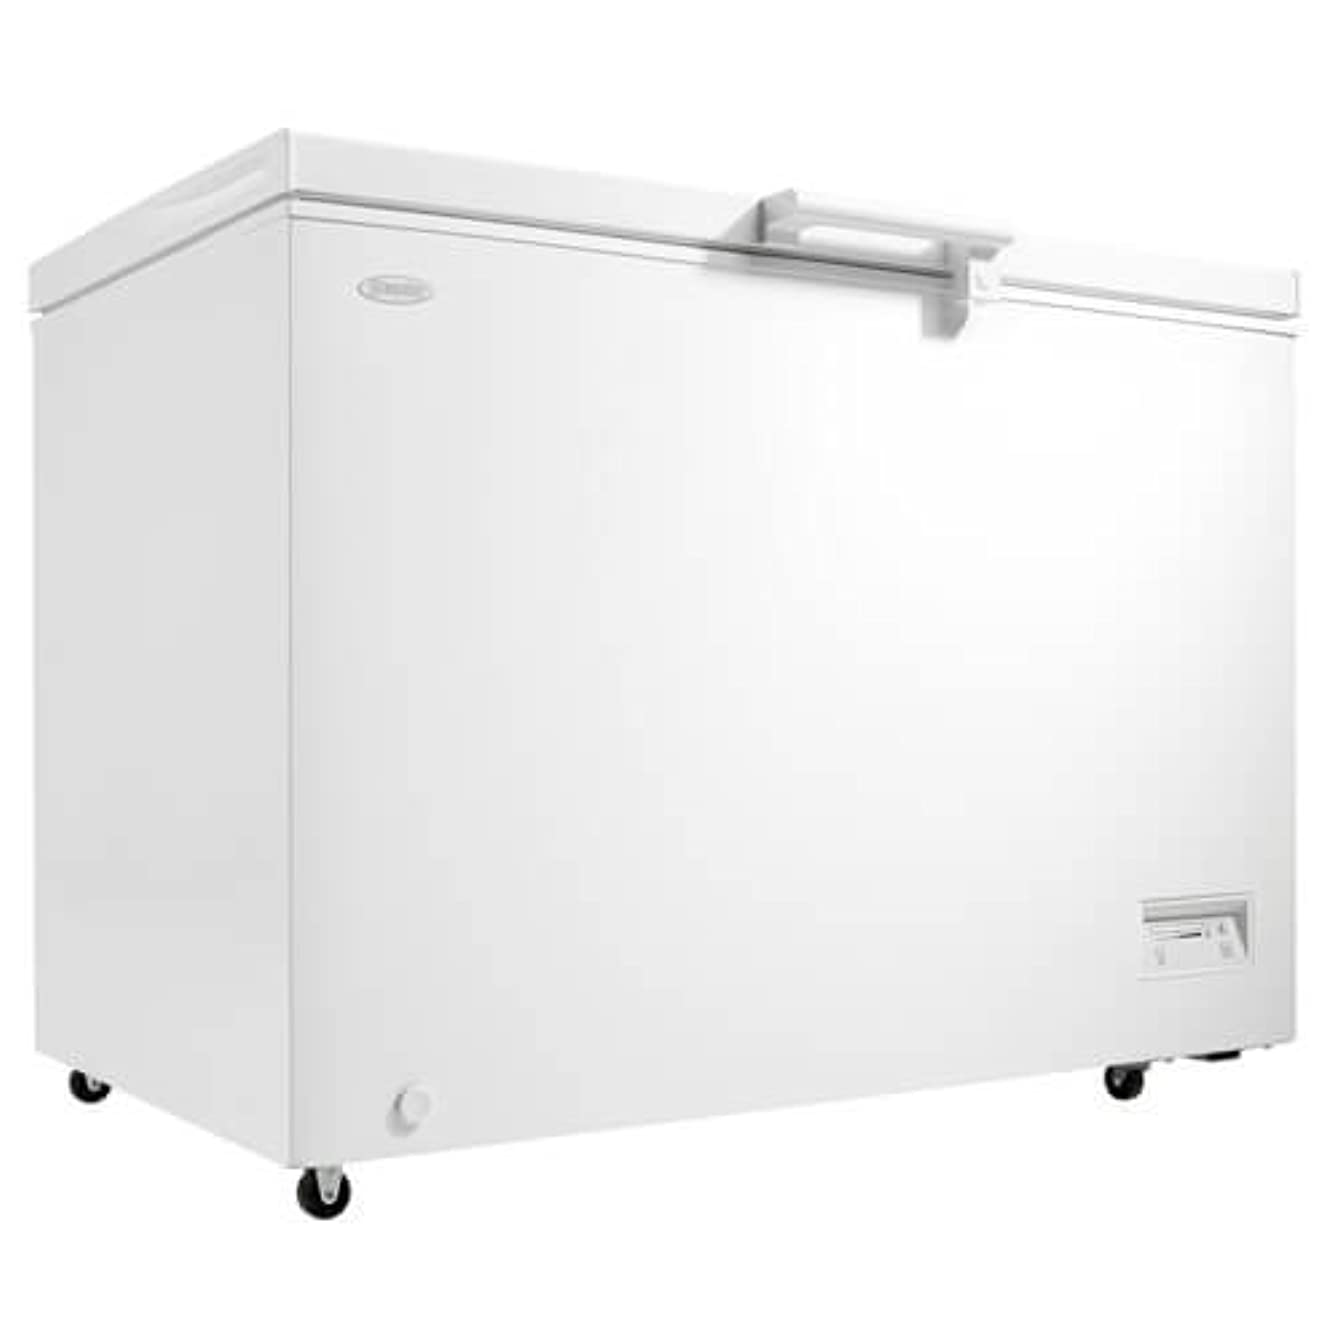 Danby 11-Cu. Ft. Chest Freezer